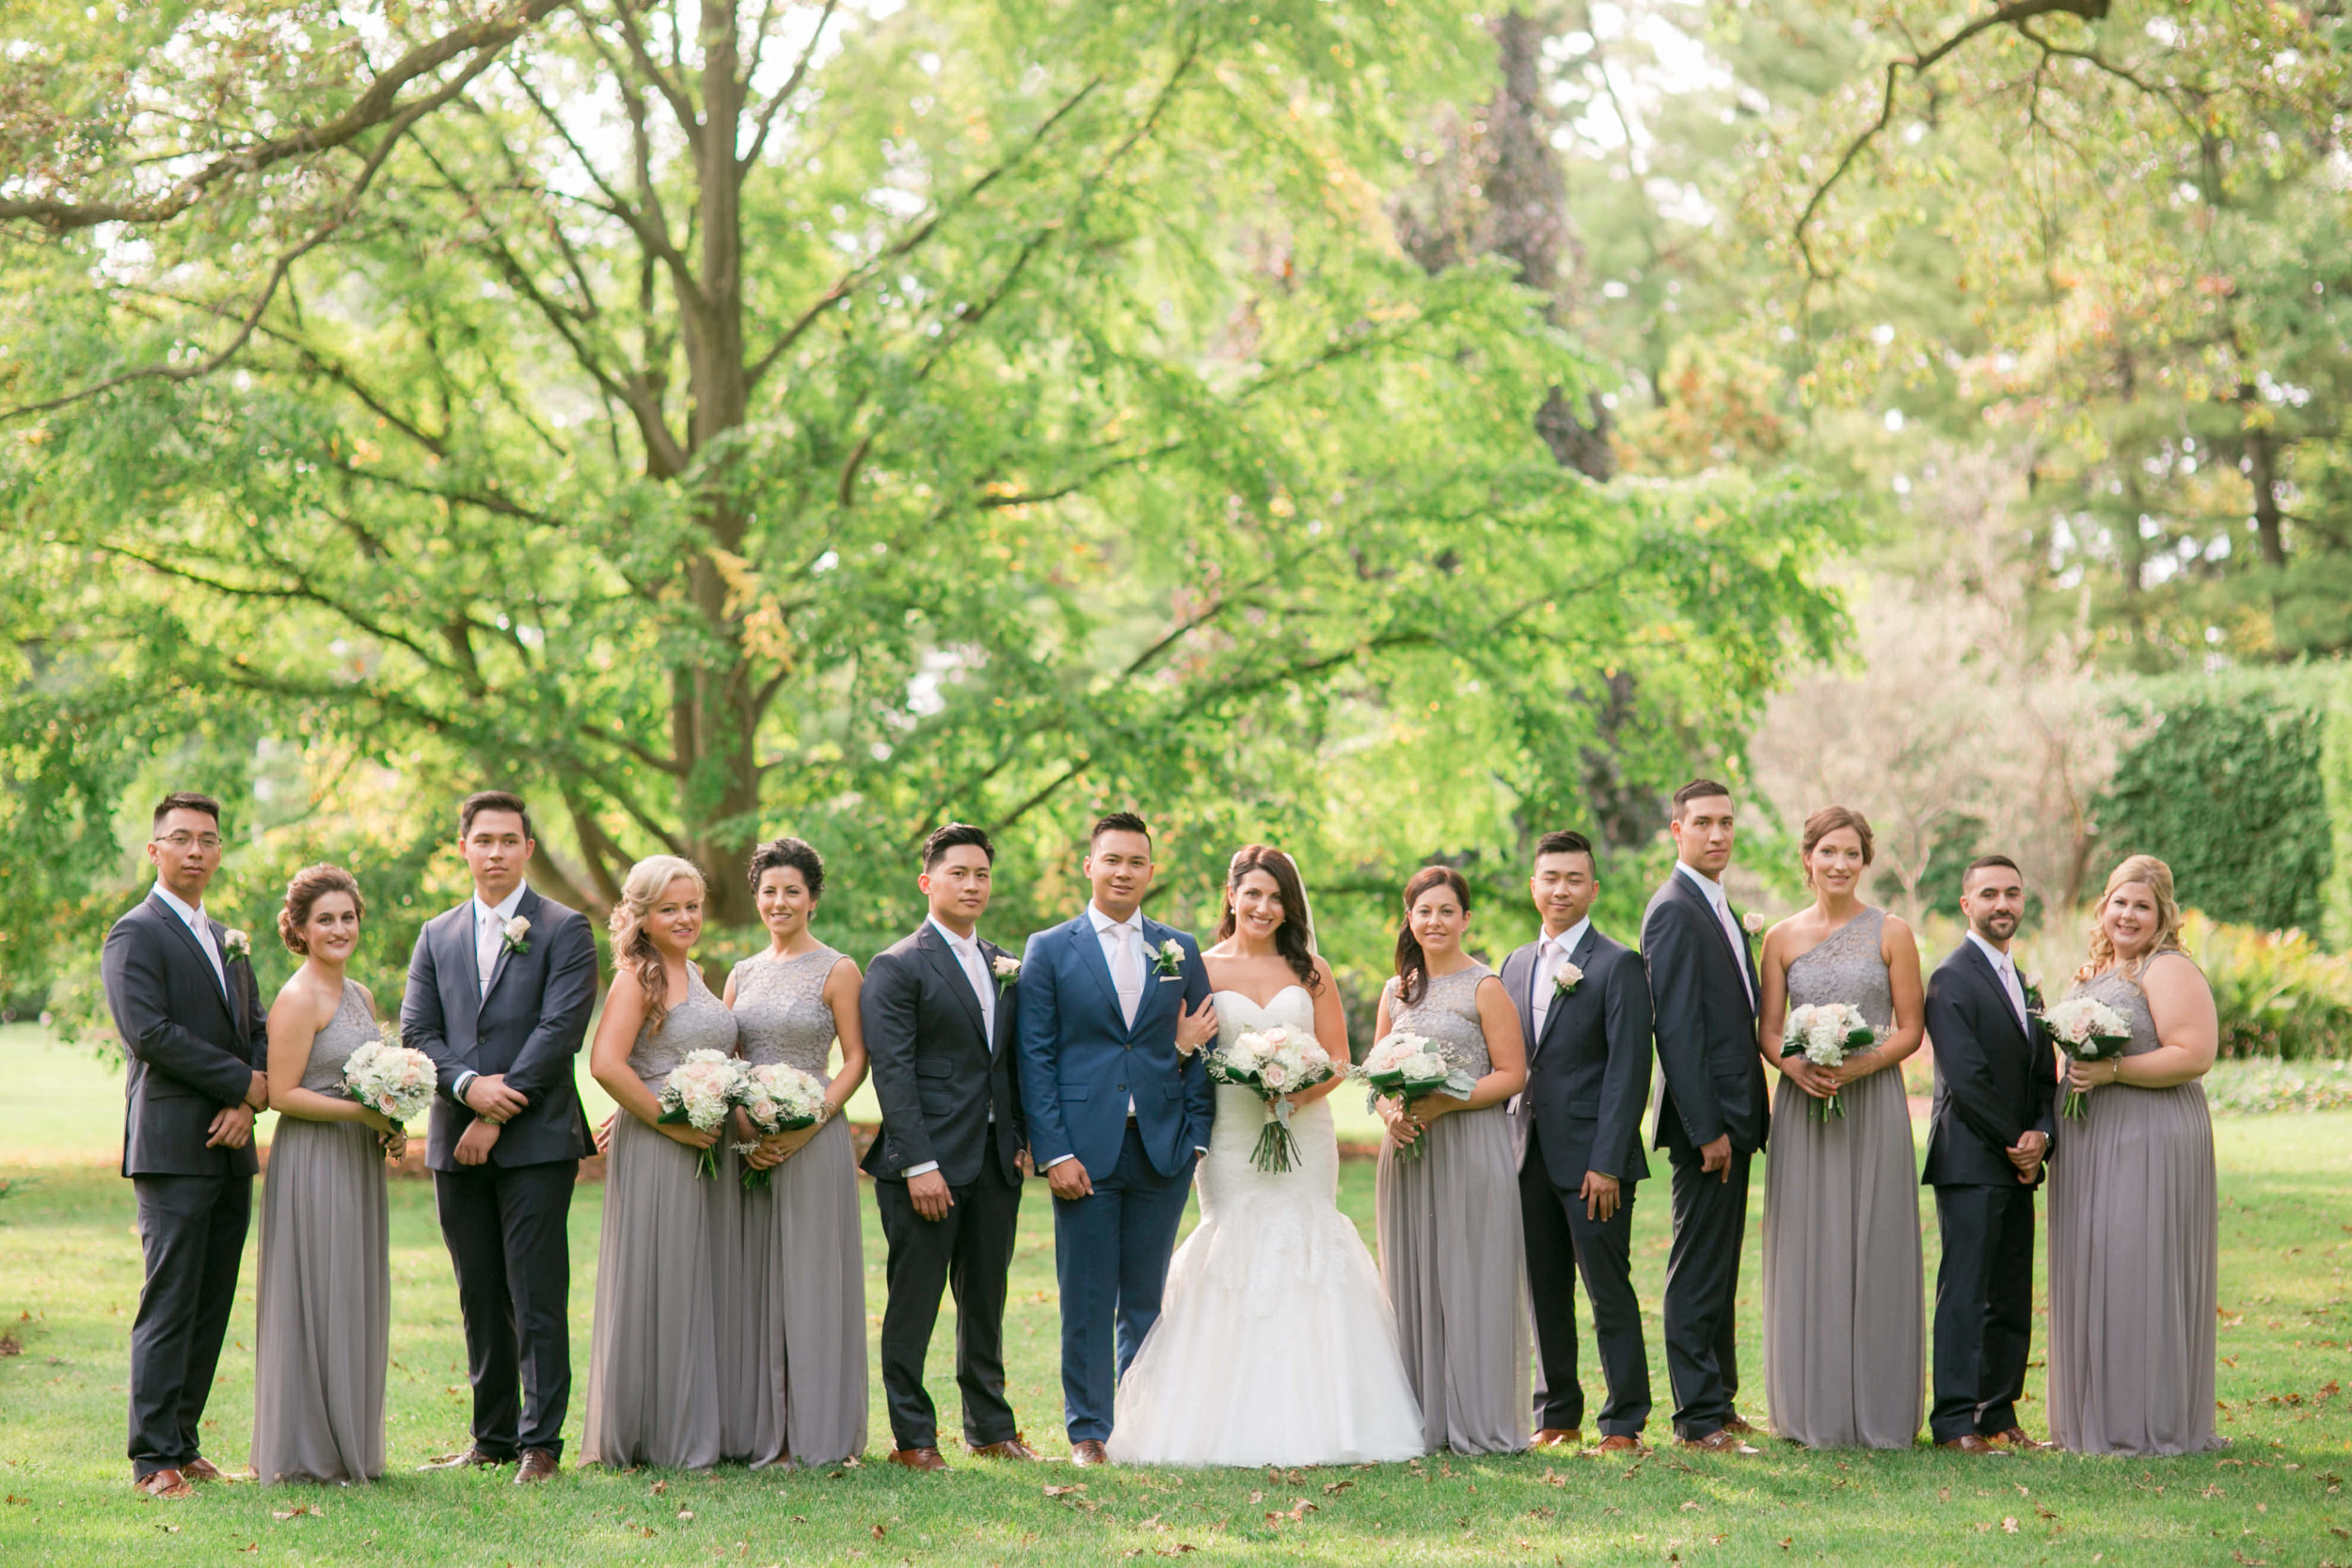 Stefanie___Bernard___Daniel_Ricci_Weddings_High_Res._Finals__286.jpg